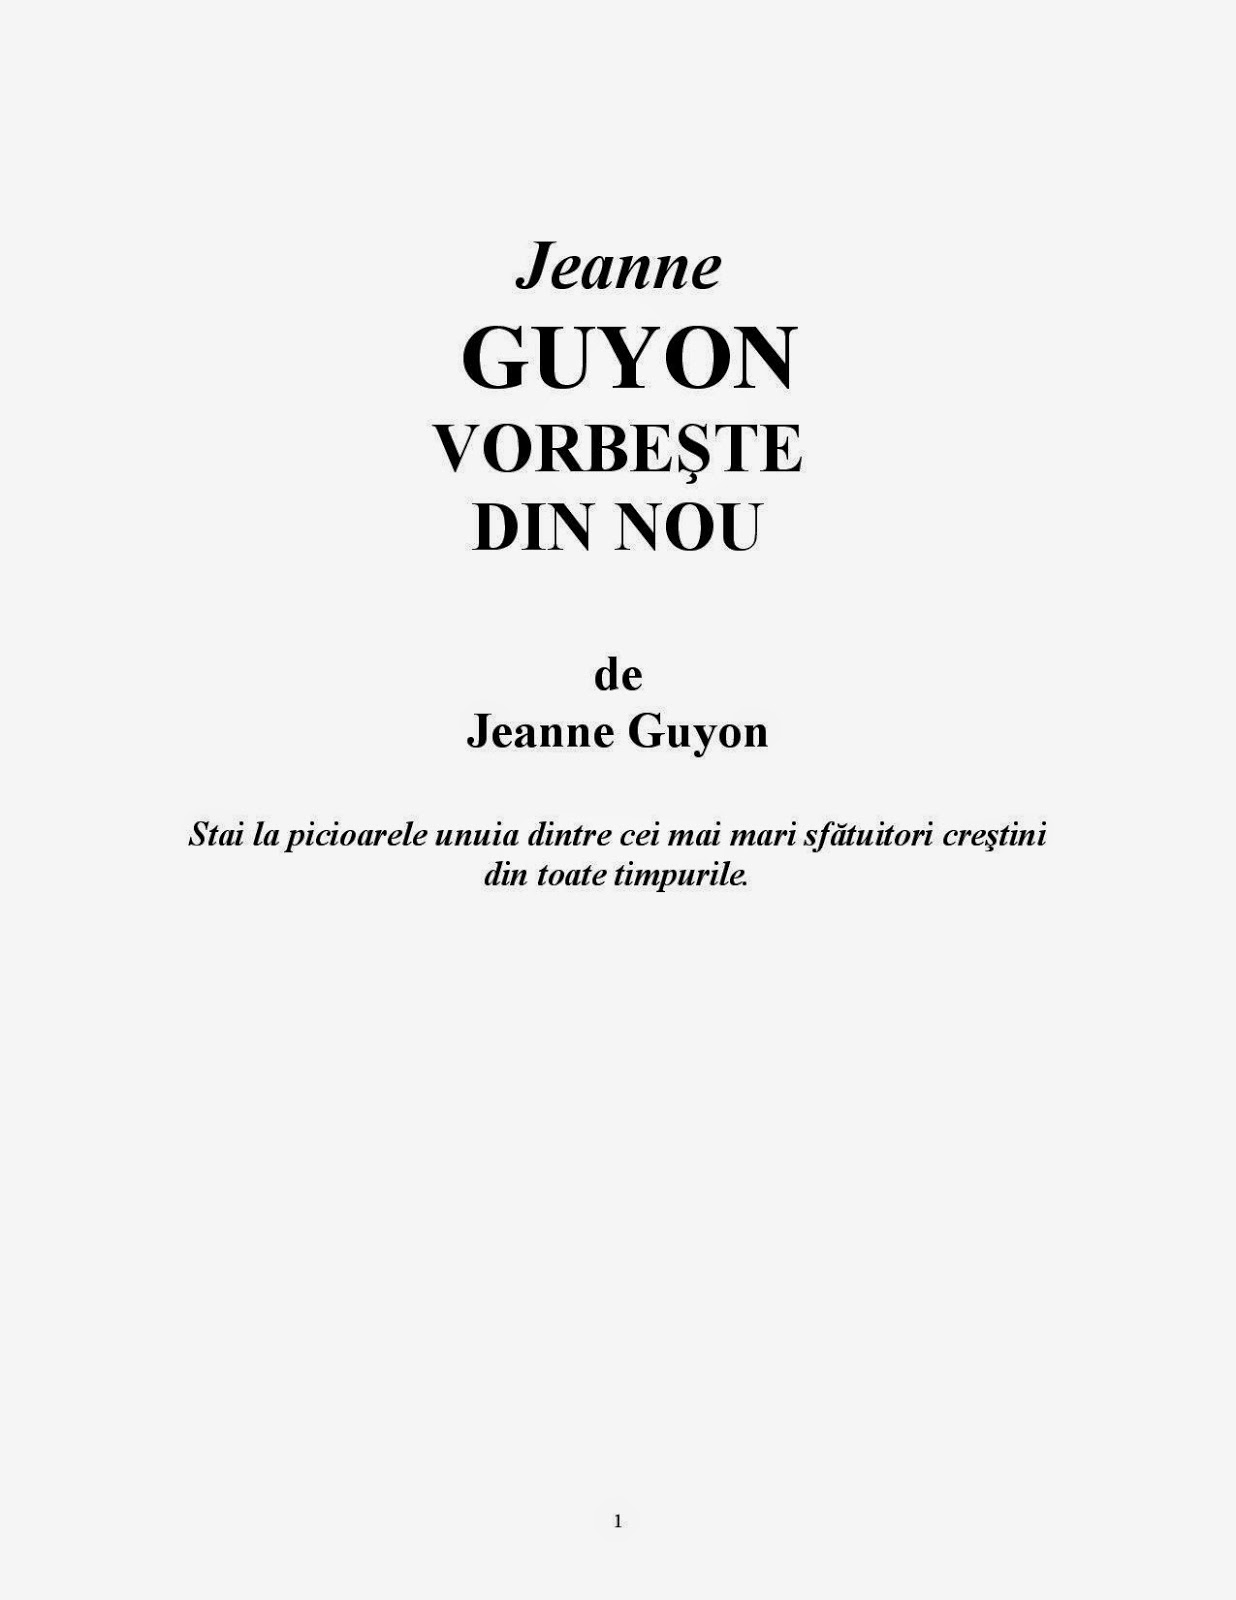 Jeanne Guyon-Vorbeşte Din Nou-